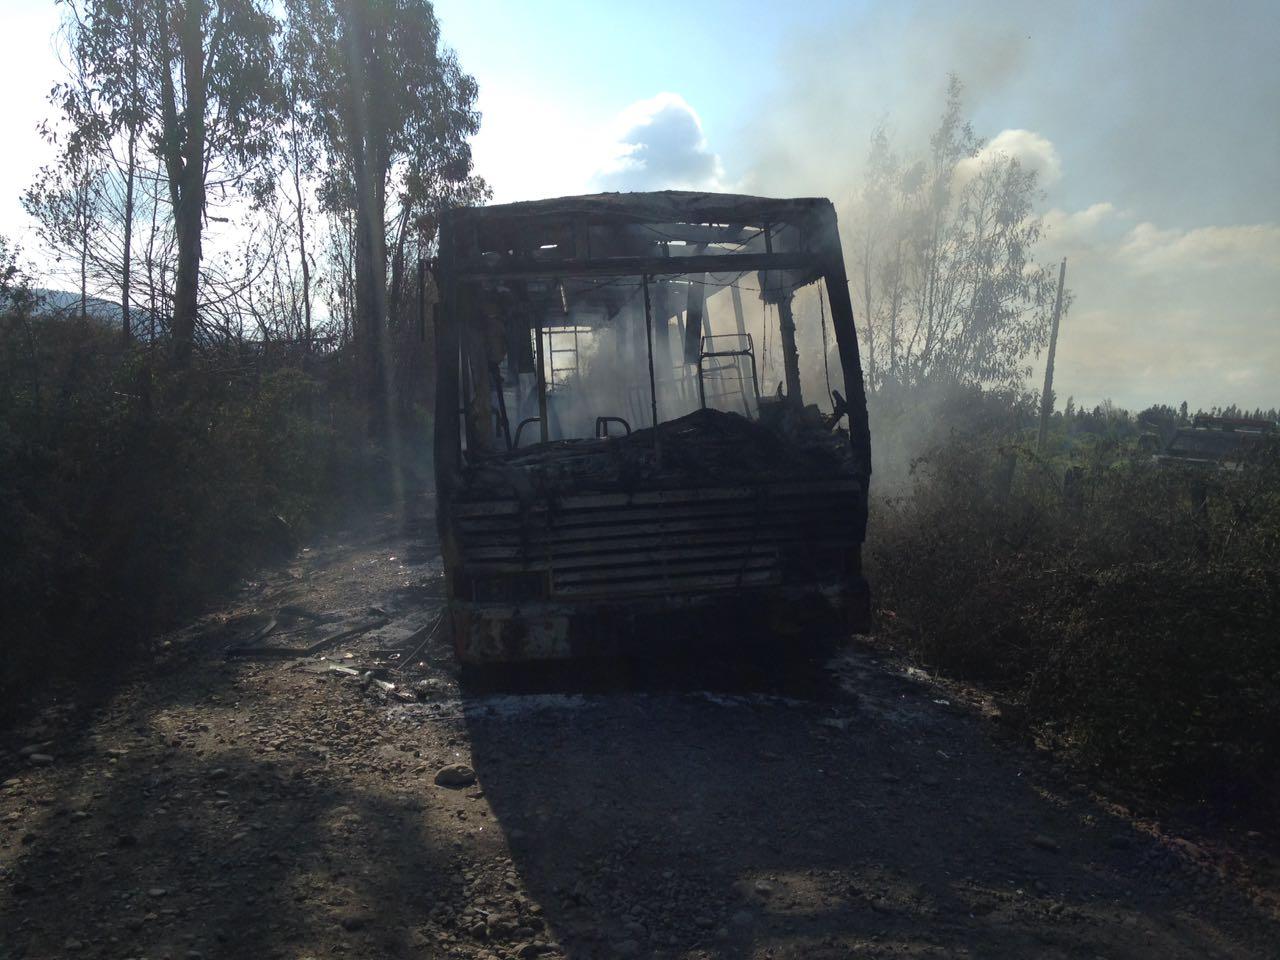 Ataque incendiario afectó a bus que trasladaba a votantes en Ercilla